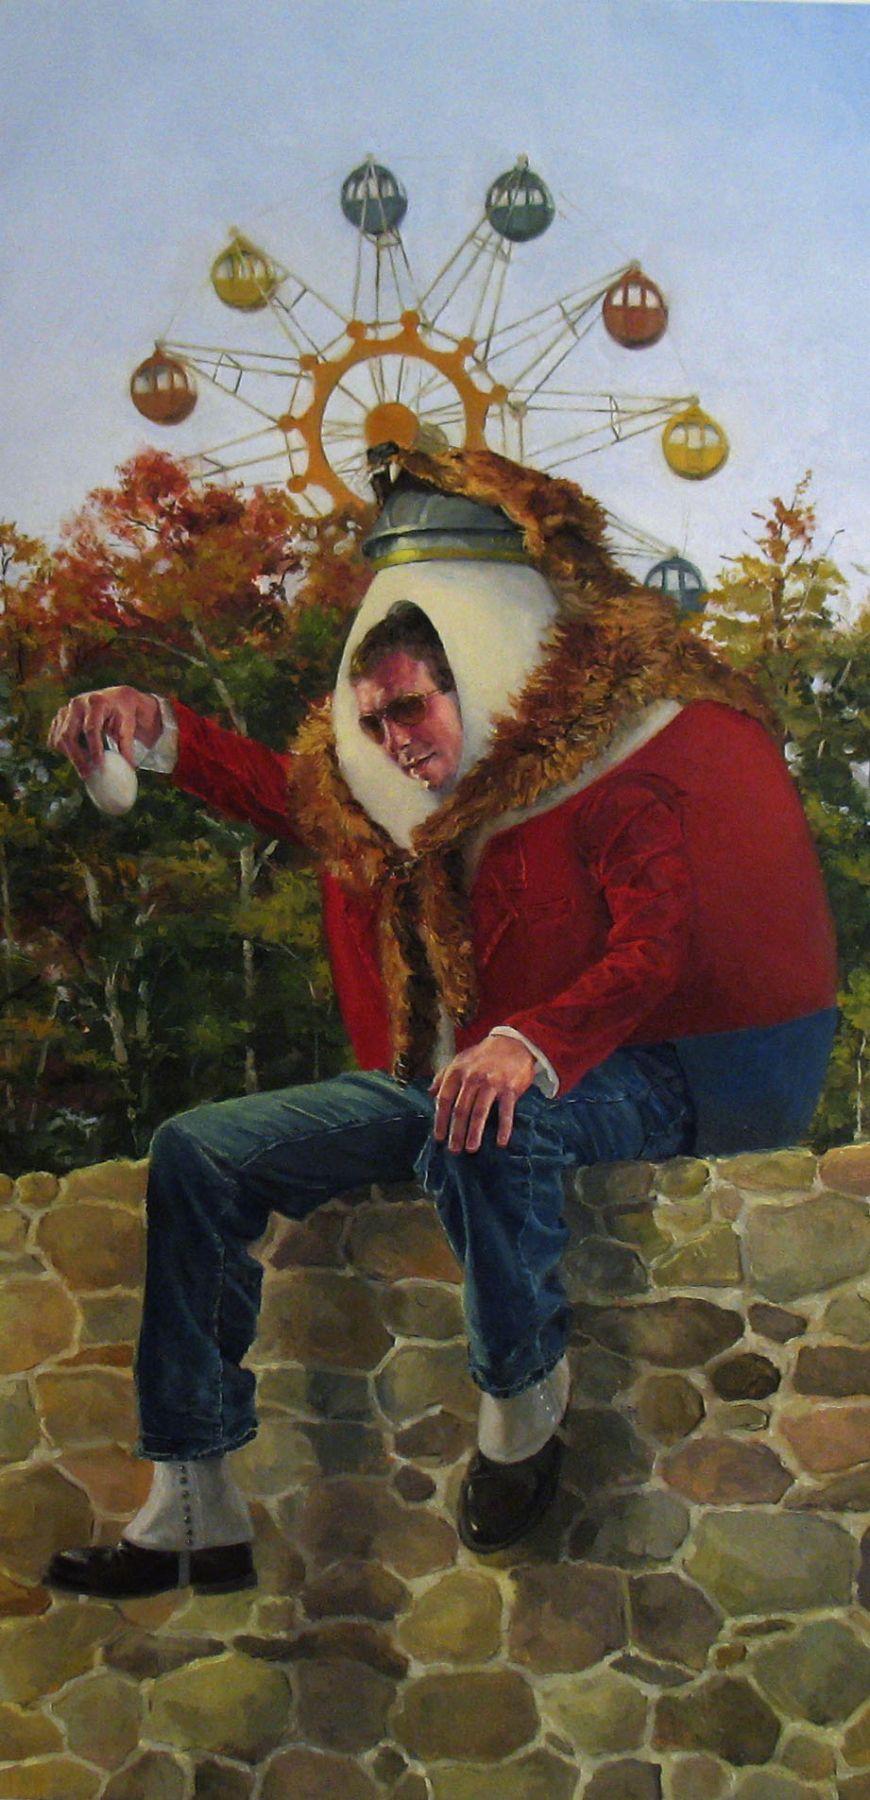 NATHANIEL ROGERS_Dumpty_The Last Viking